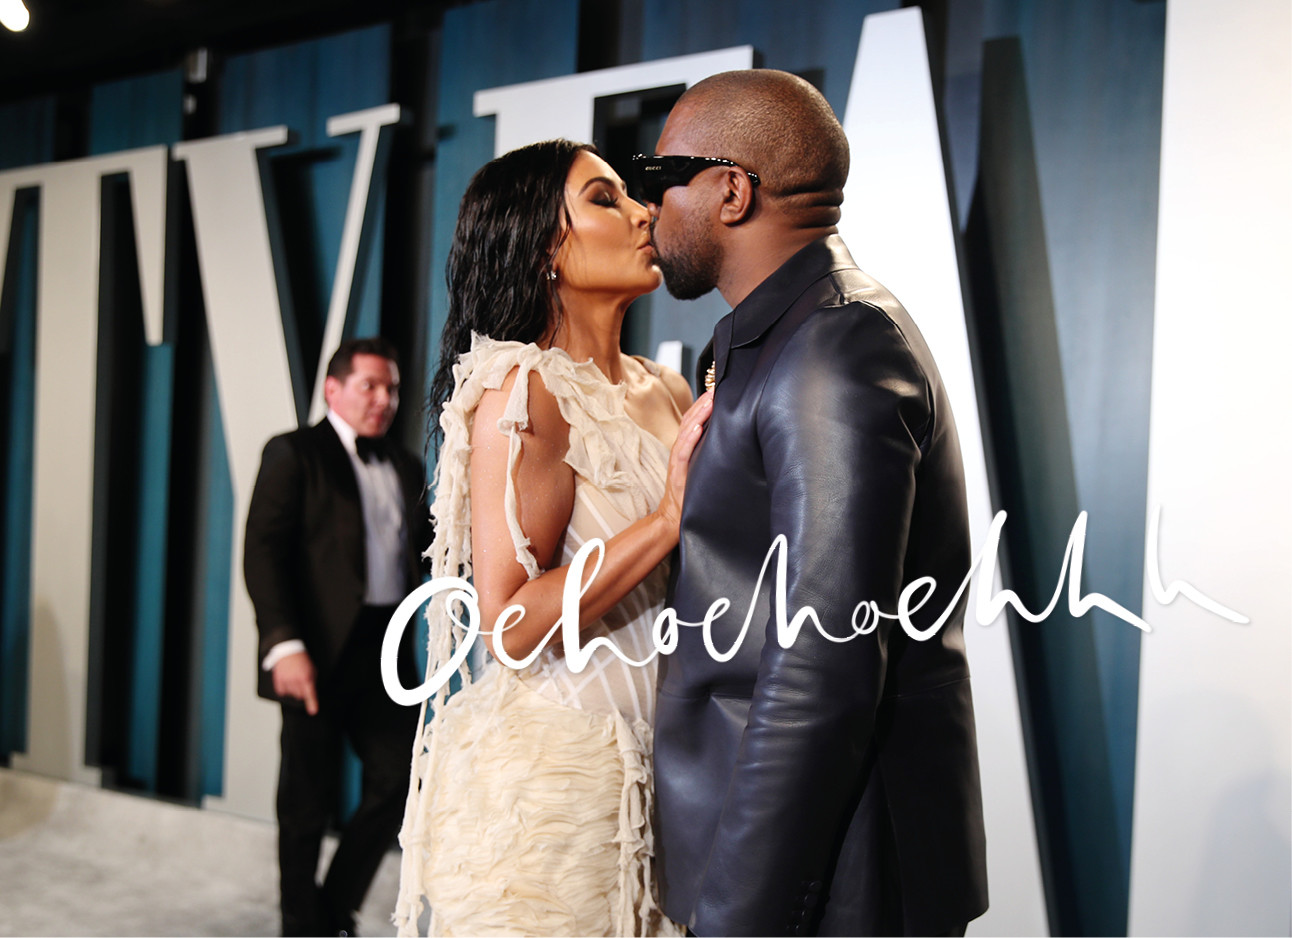 Kim Kardashian en Kanye west kussend op de rode lopen bij Vanity Fair